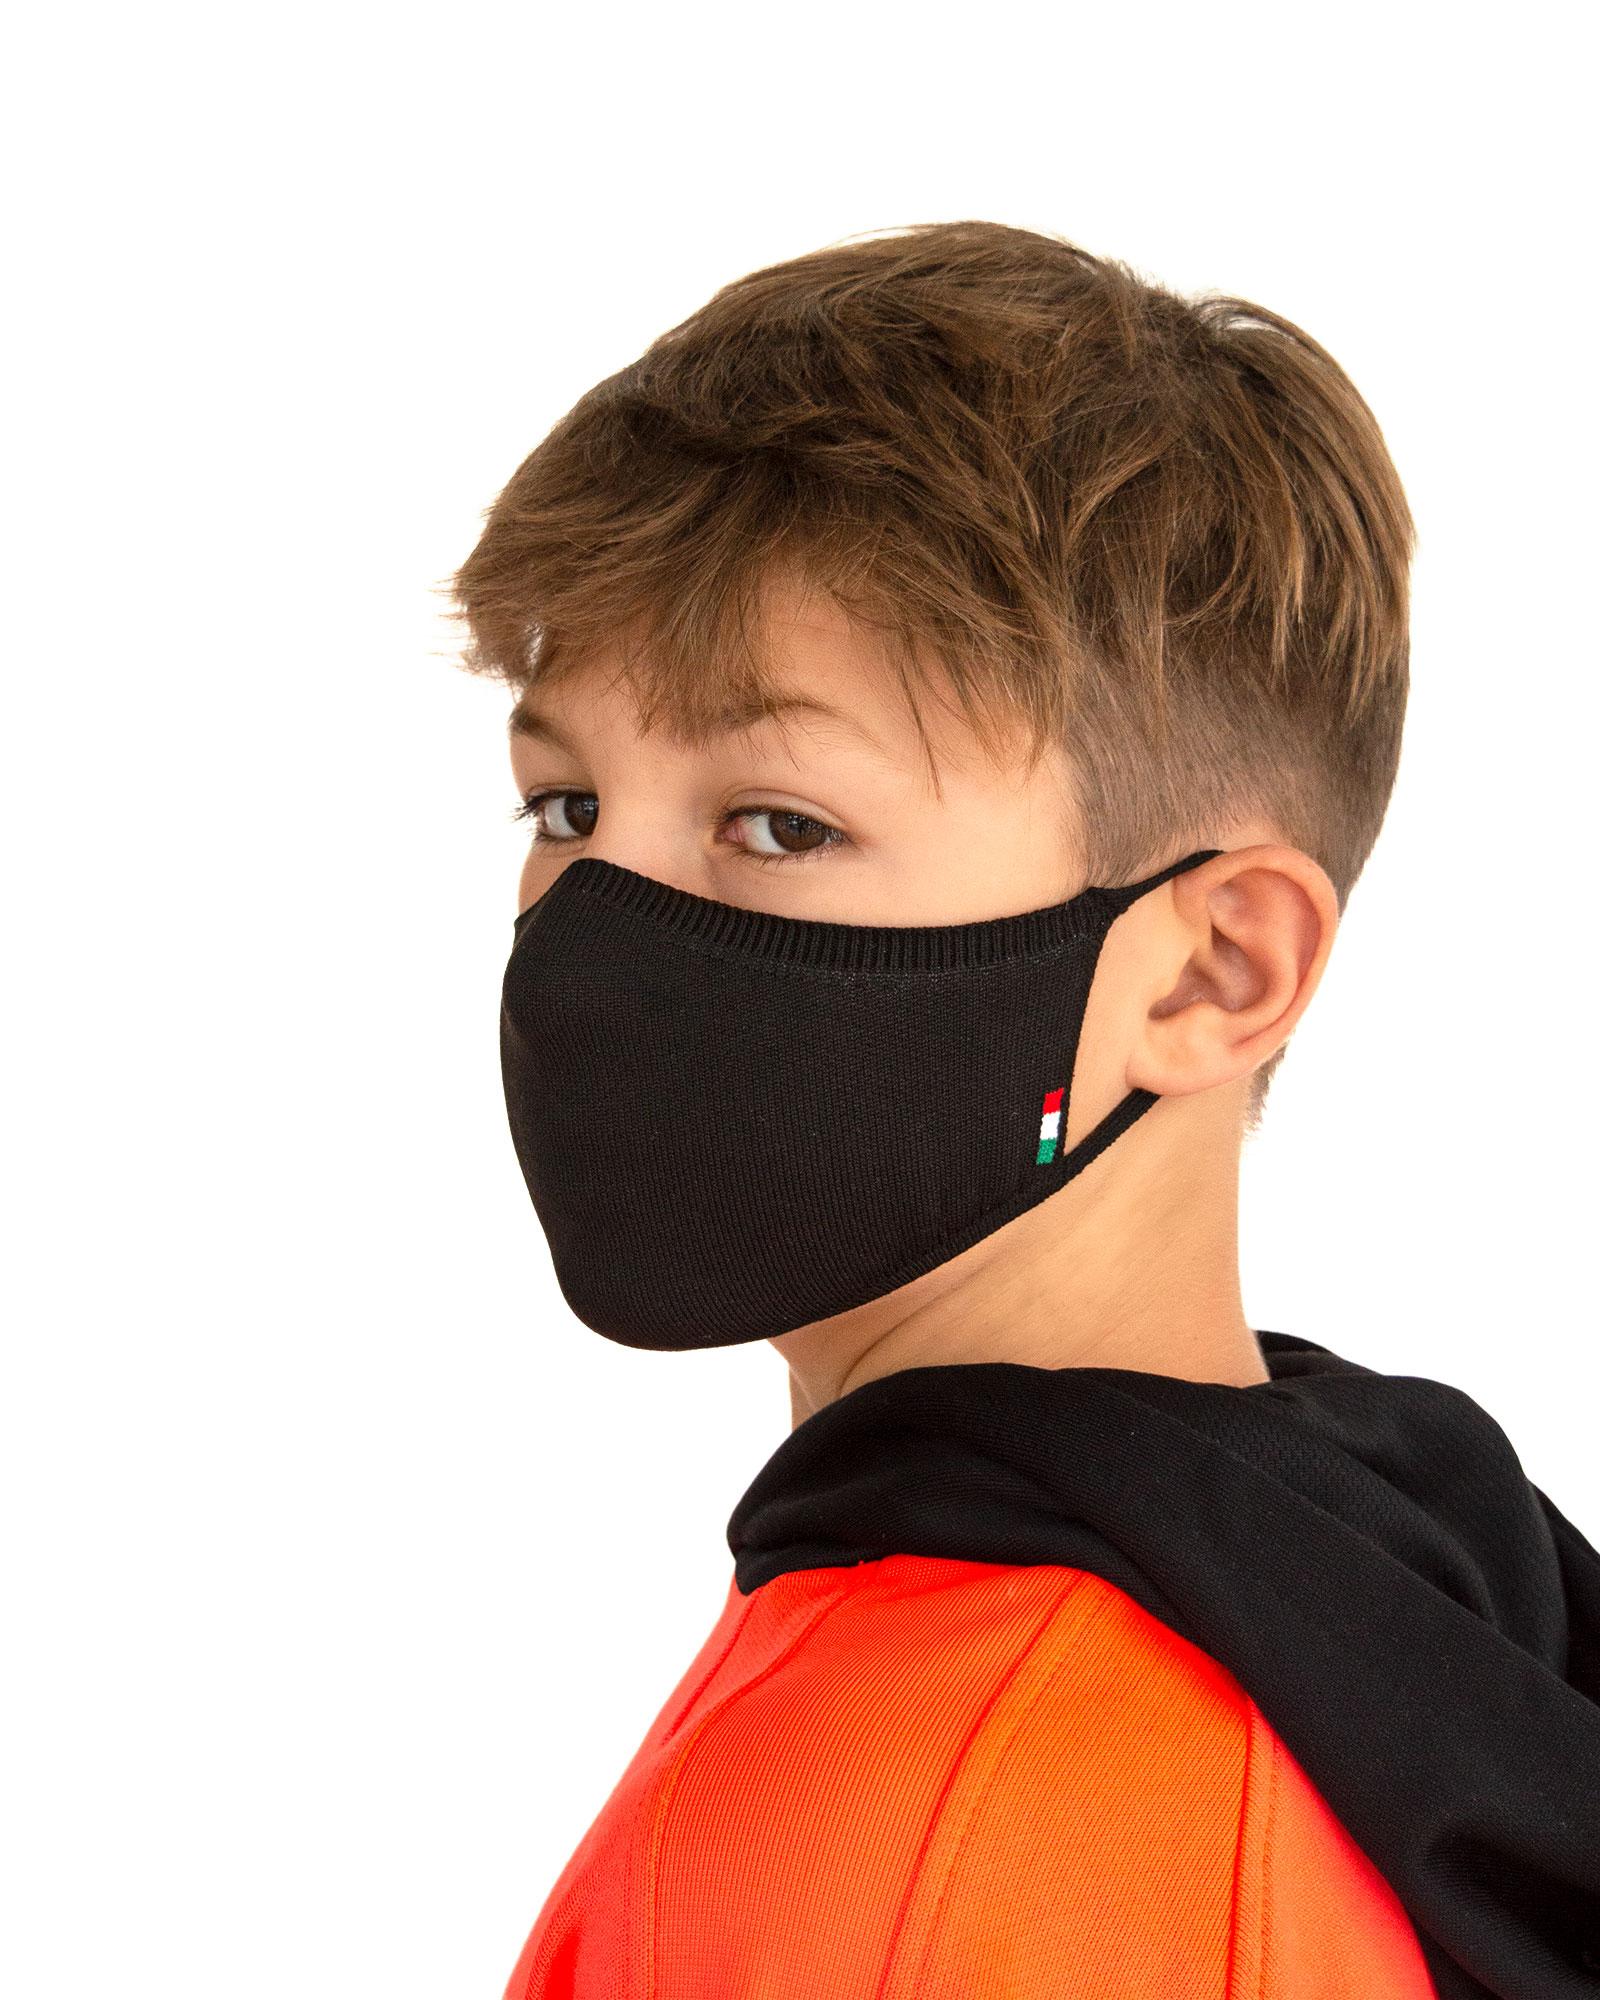 KIDS-MASK-01S-relaxsan-unima-kids-mask_353-BLACK_boy